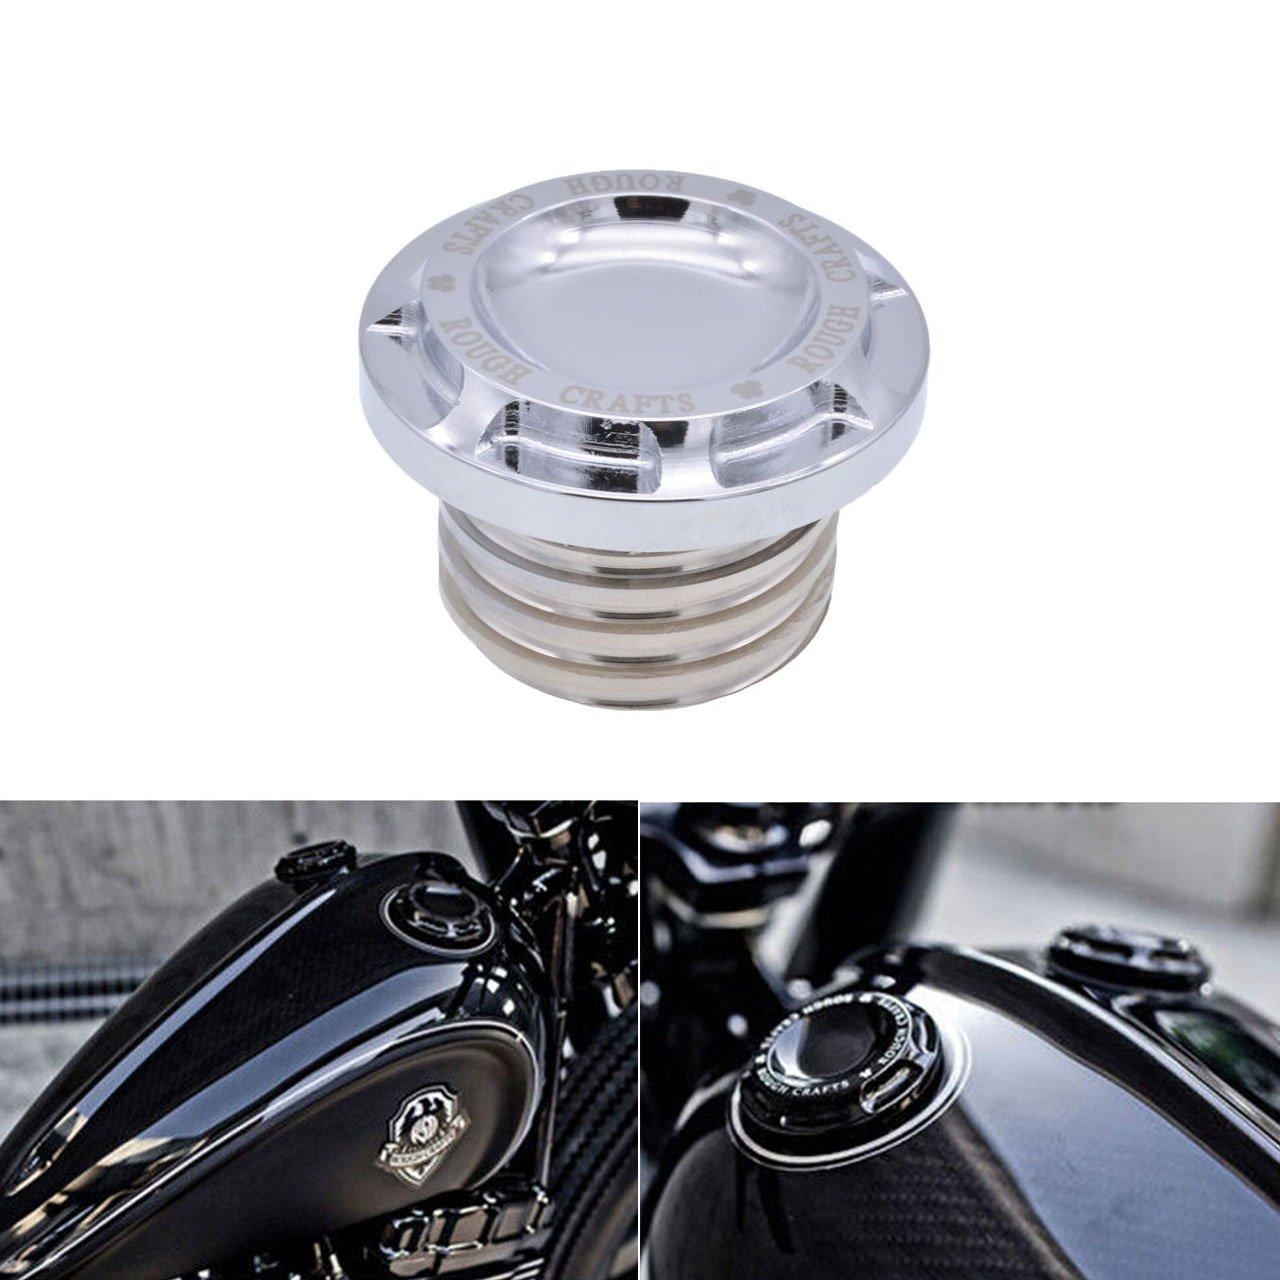 KaTur Motocicleta Negro CNC Rough Manualidades Aluminio Combustible Gas Aceite Cap para Harley Sportster XL 1200 883 1996 –  2014